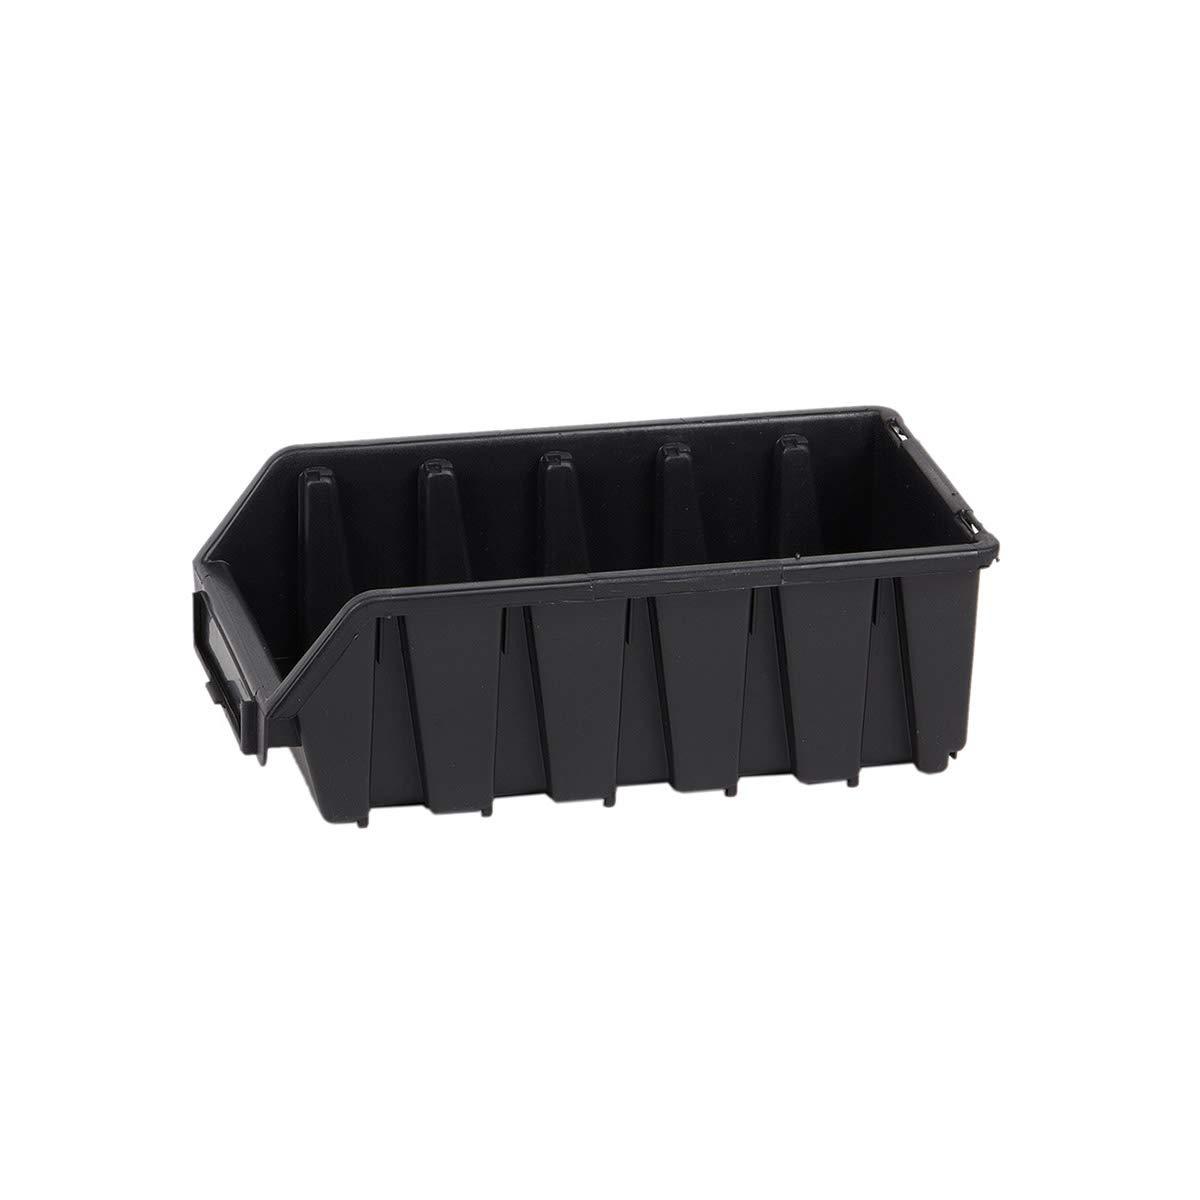 1 Stü ck Blau Langformat Stapelbox Materialbox Regalbehä lter Werkstattkiste myBoxshop PL1-5462